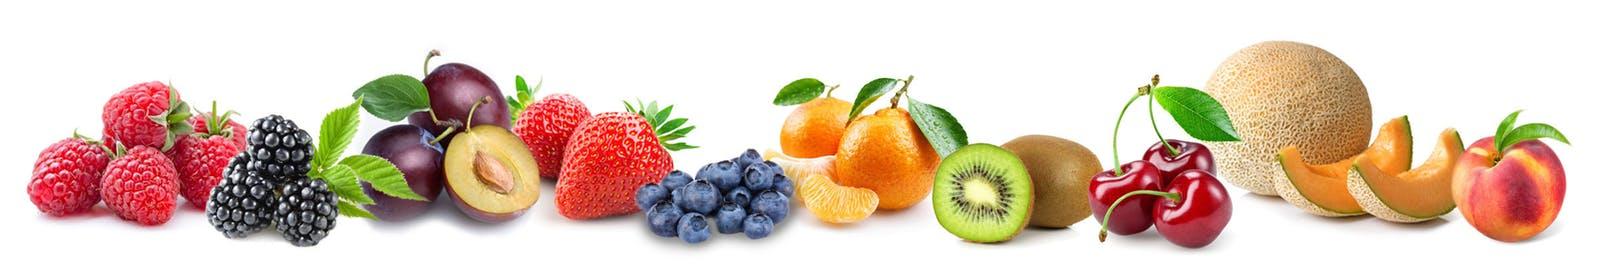 The Palto top 5 fruits.jpg